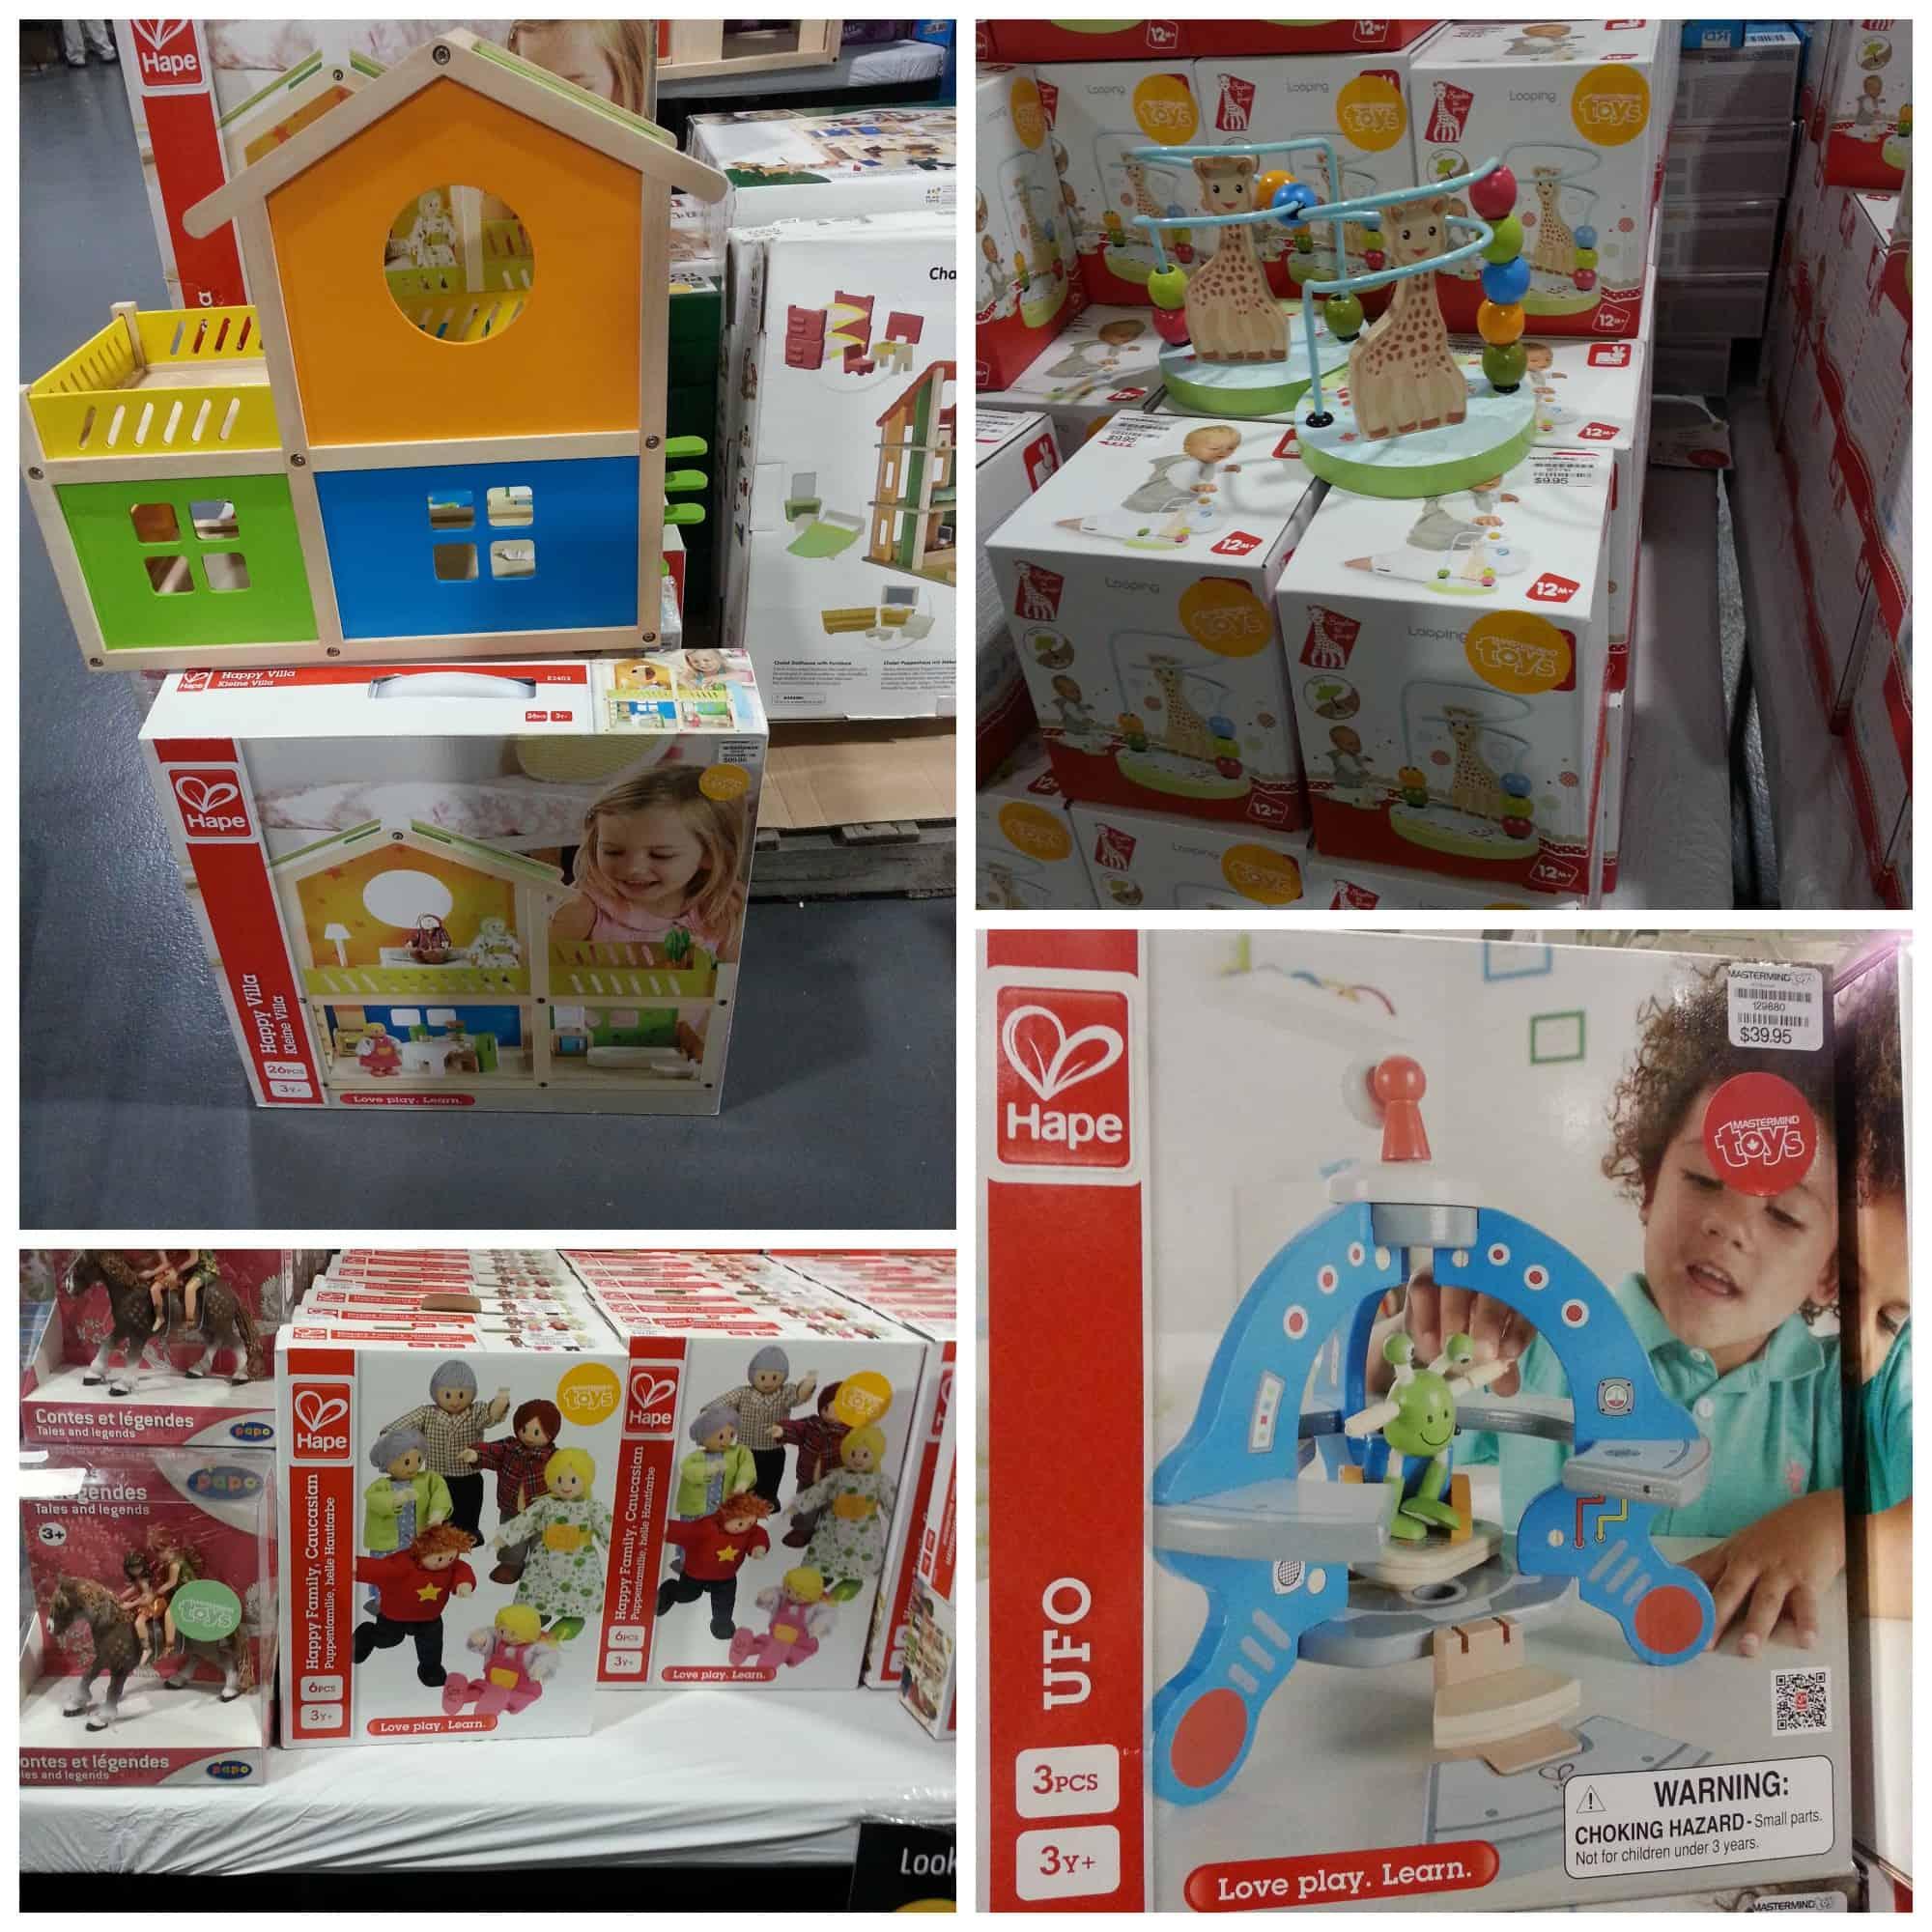 mastermind toys warehouse sale 2014 Hape wodden toys